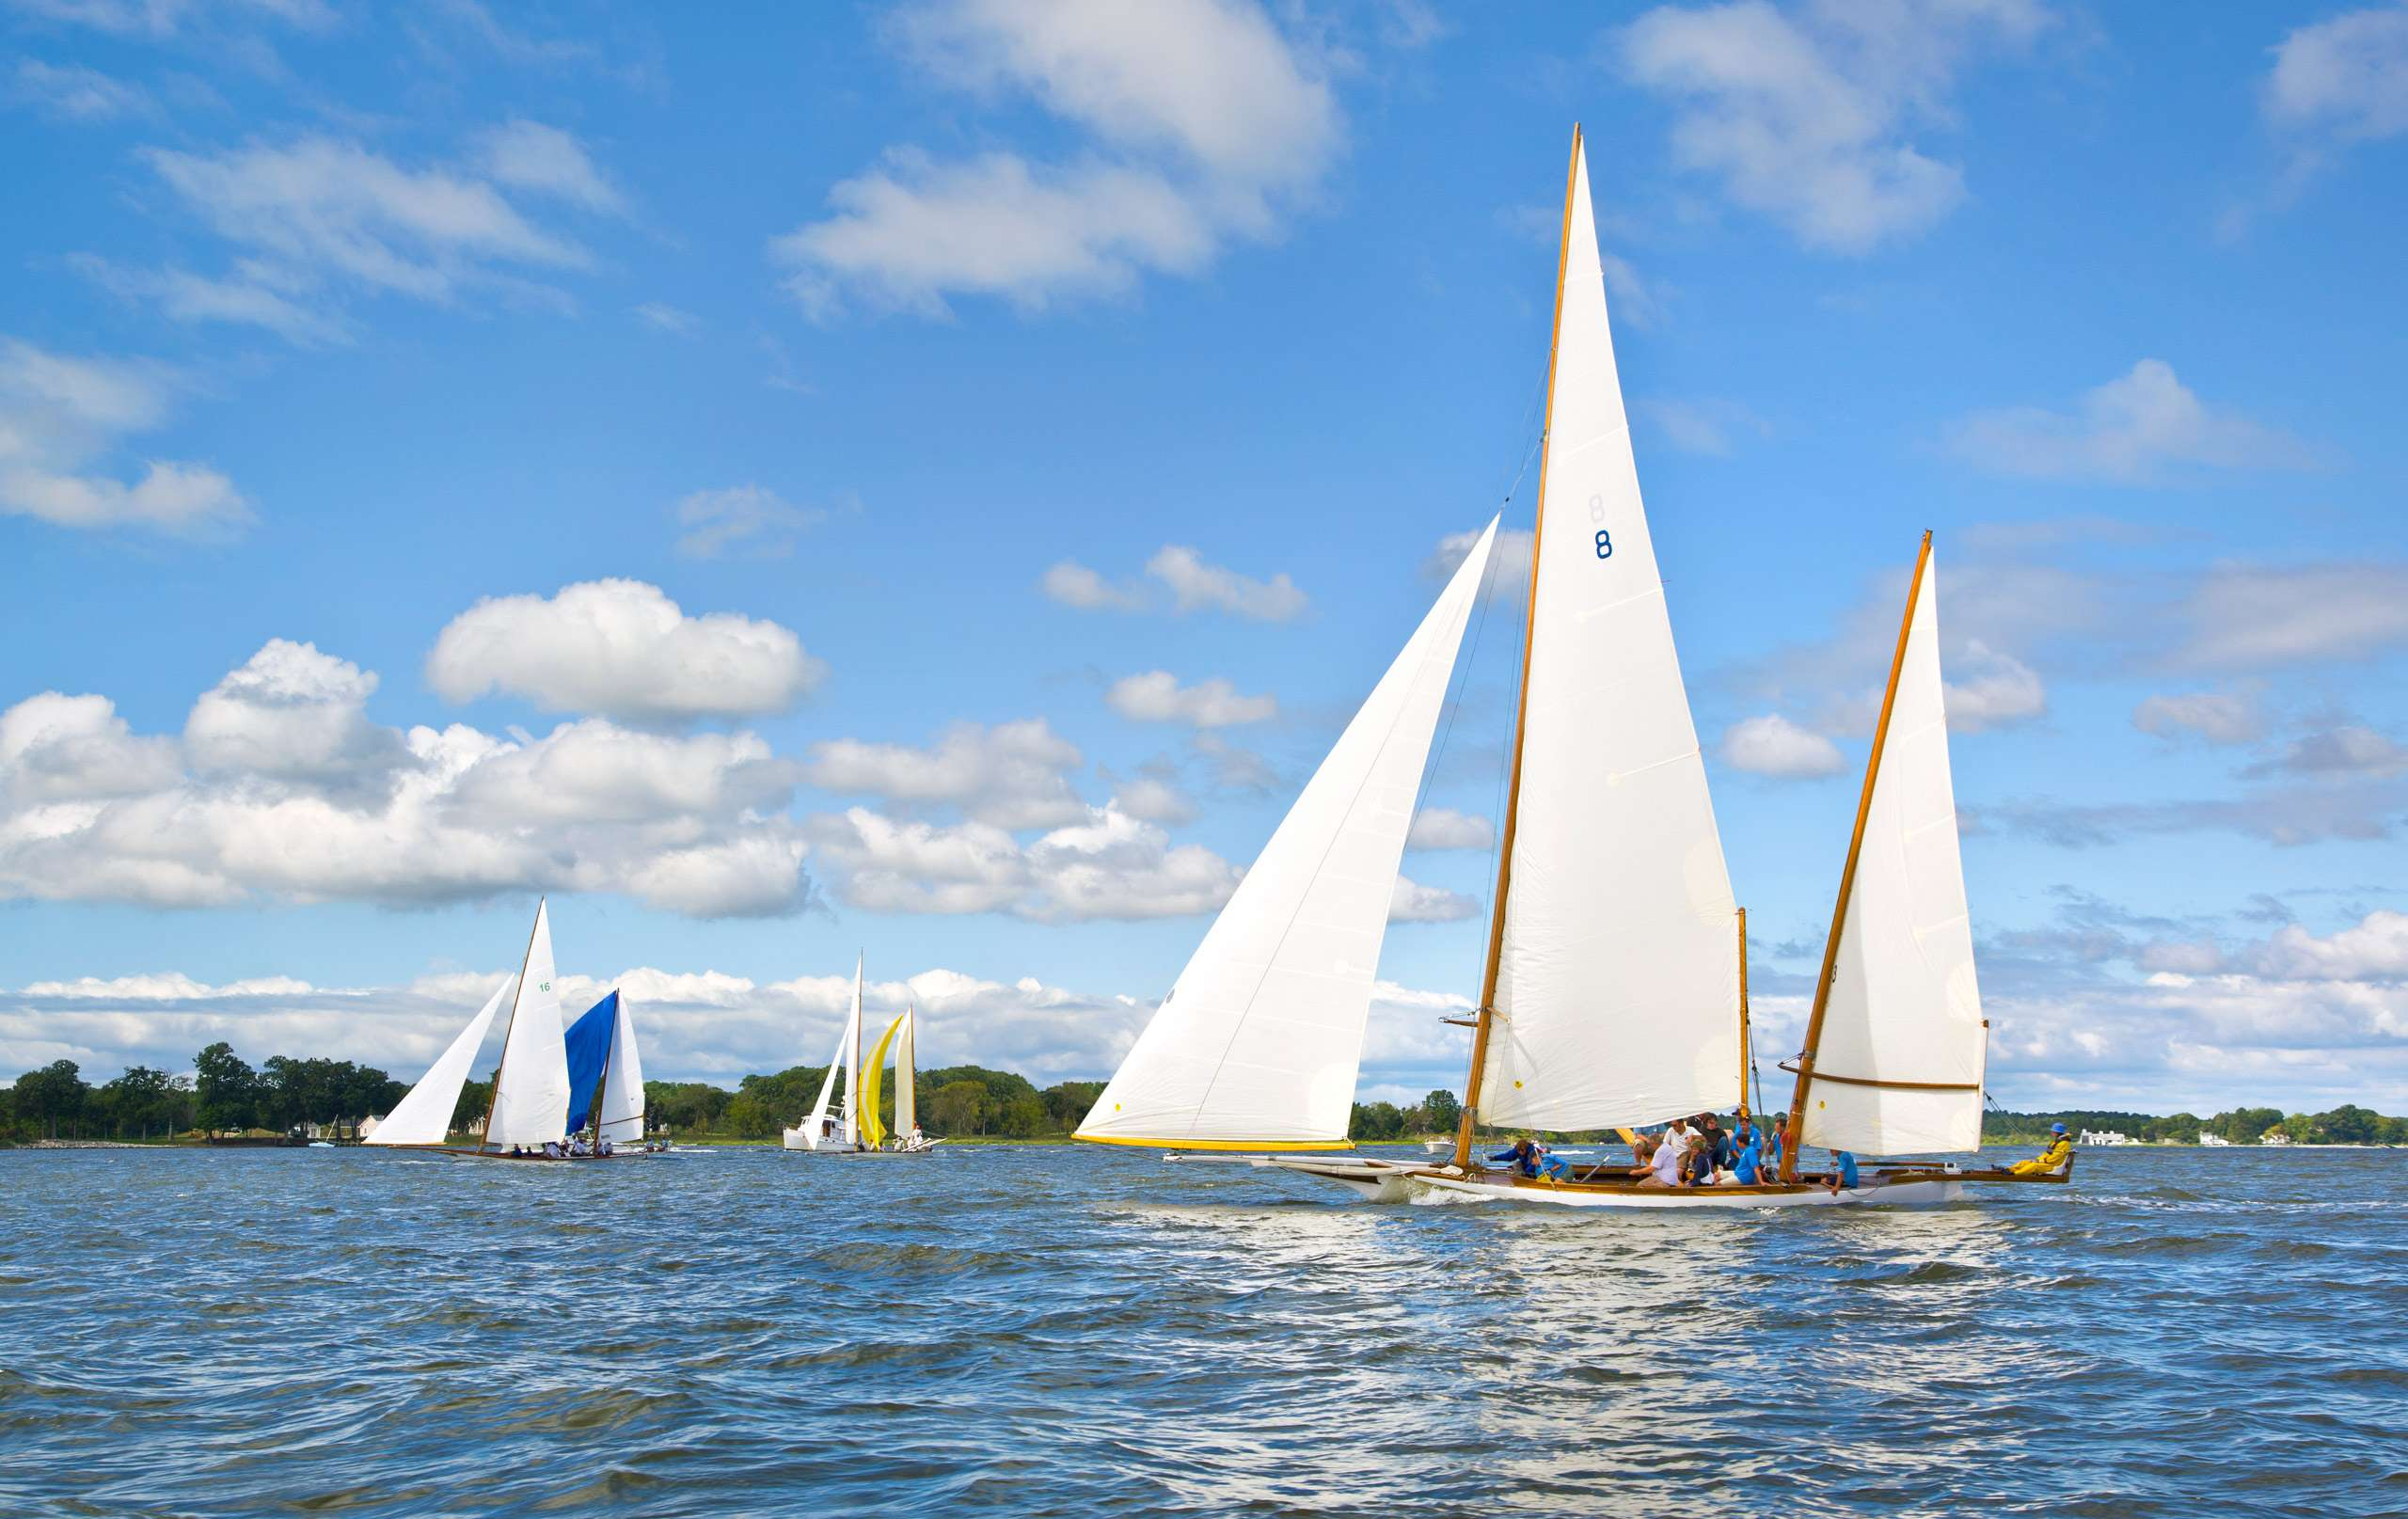 PORTFOLIO - Sailing - Log Canoes #15   PCG529